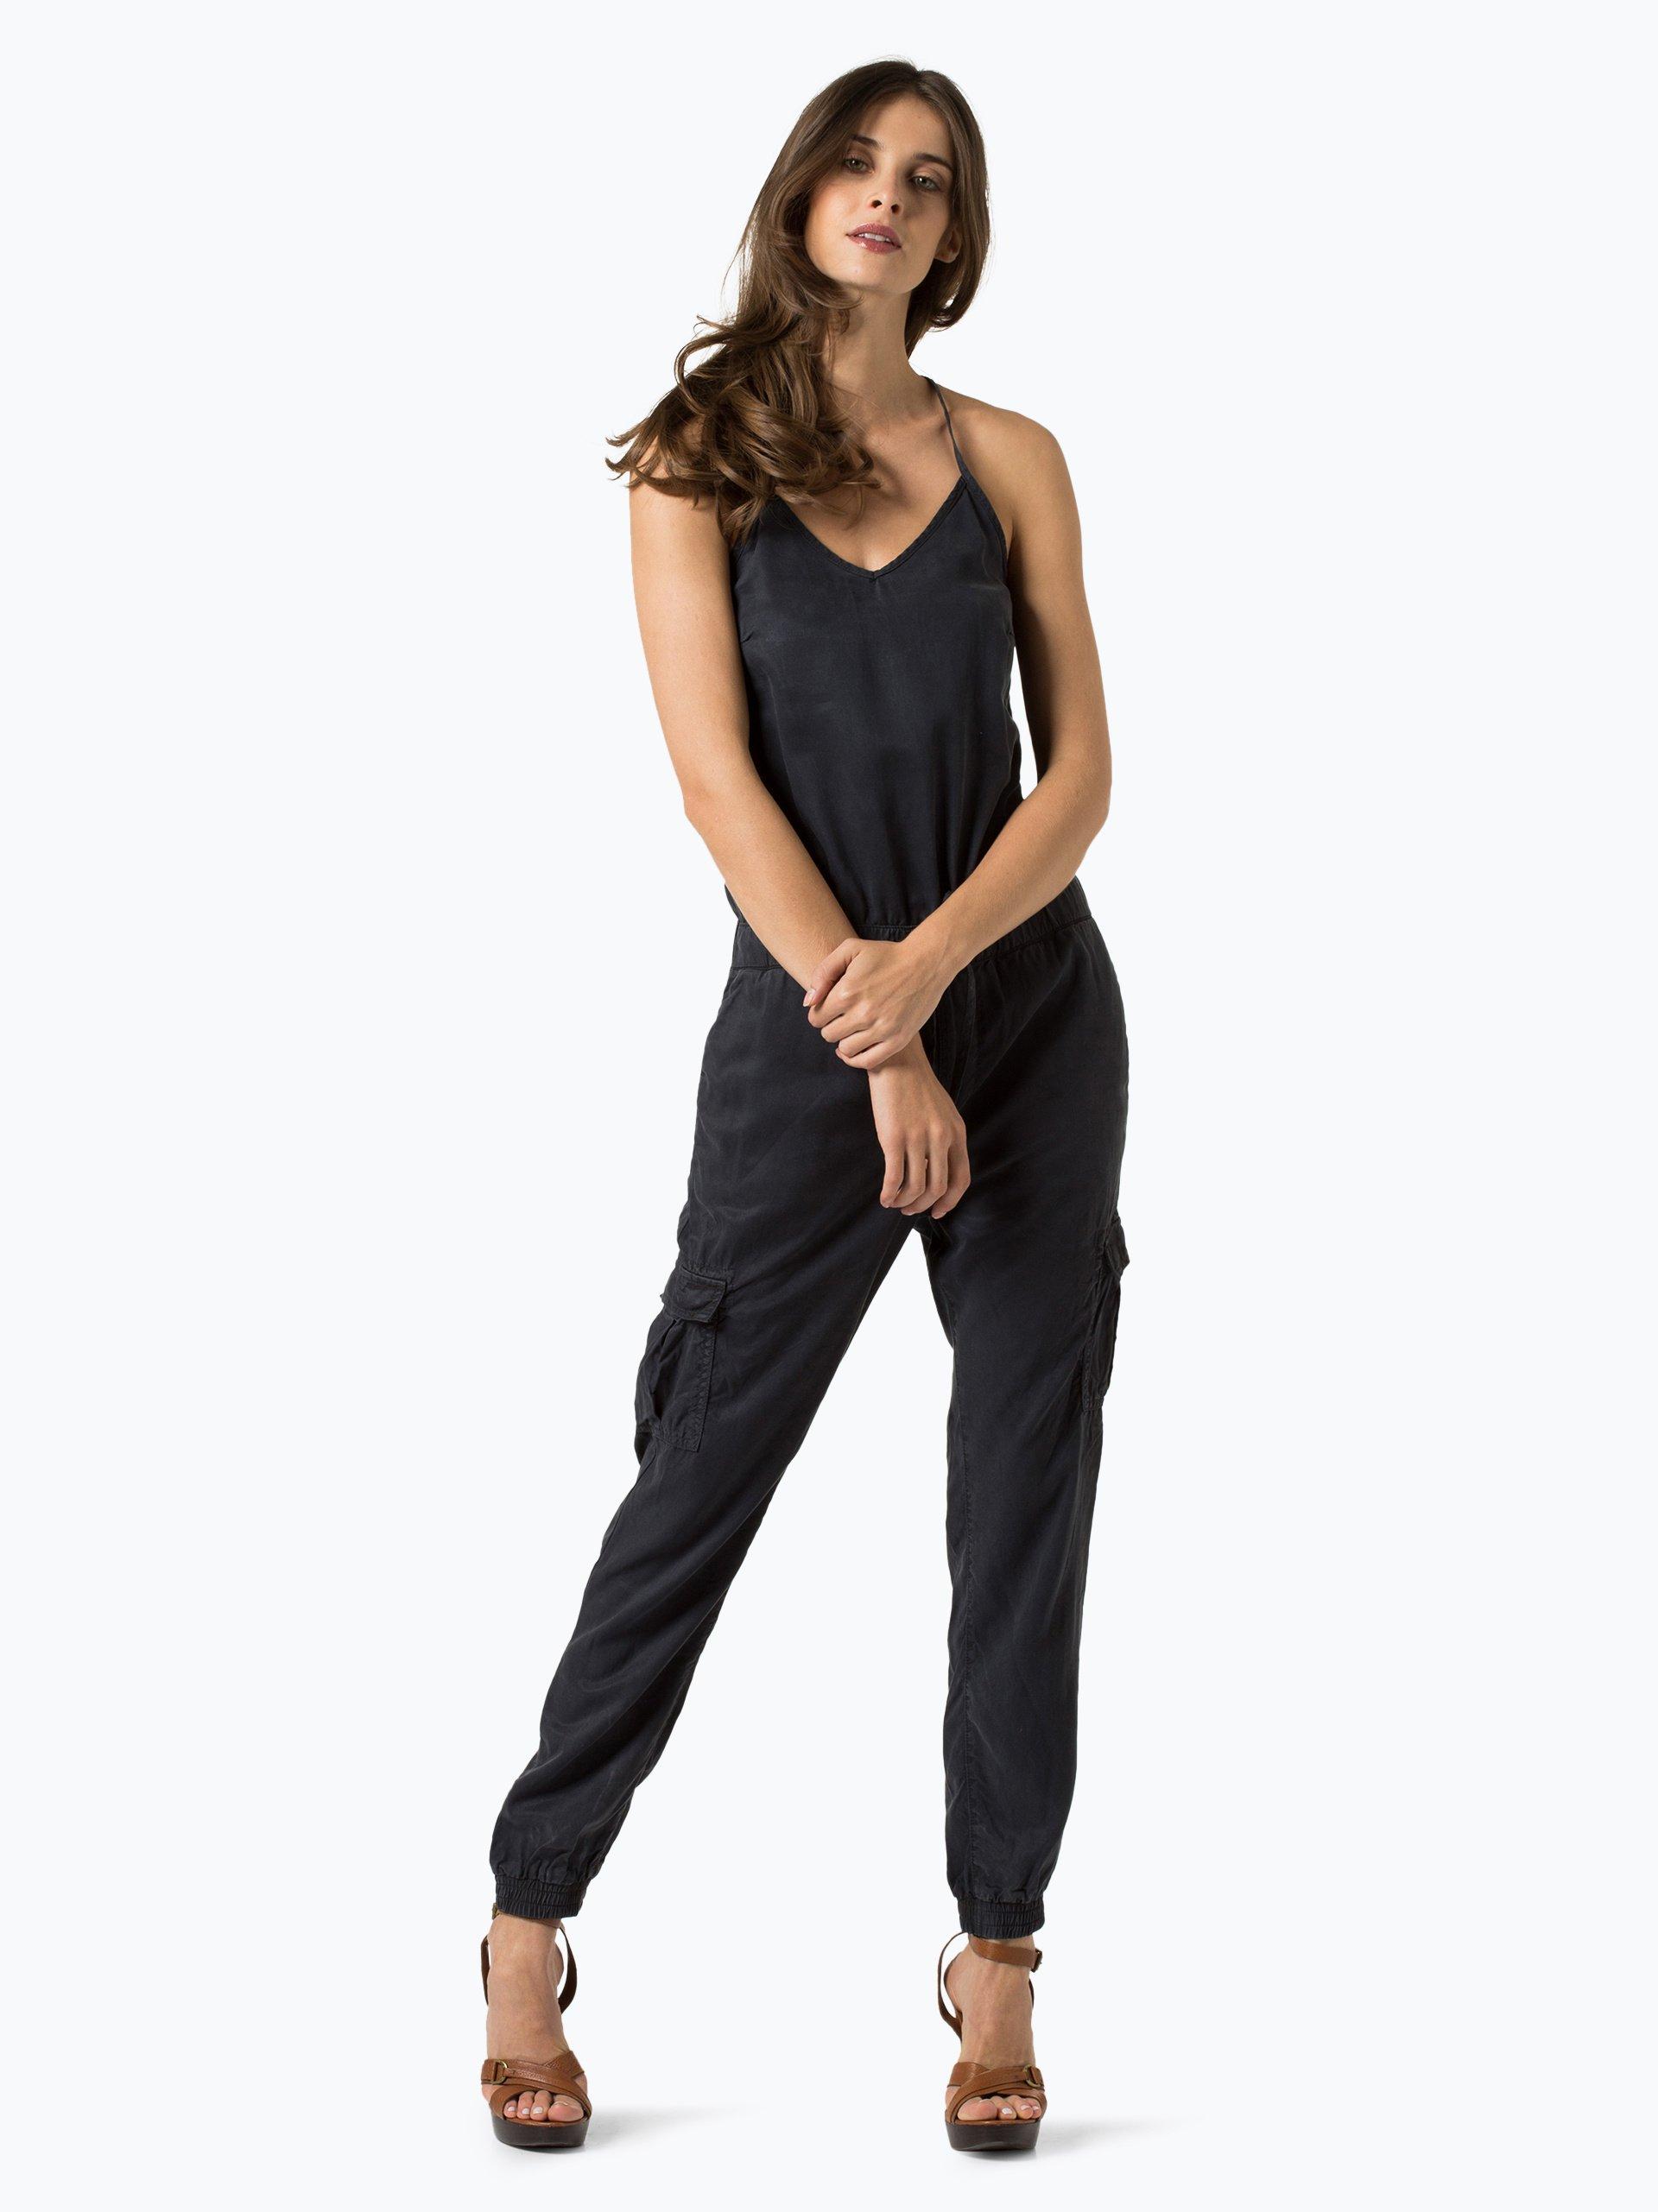 pepe jeans damen jumpsuit quest anthrazit uni online kaufen vangraaf com. Black Bedroom Furniture Sets. Home Design Ideas